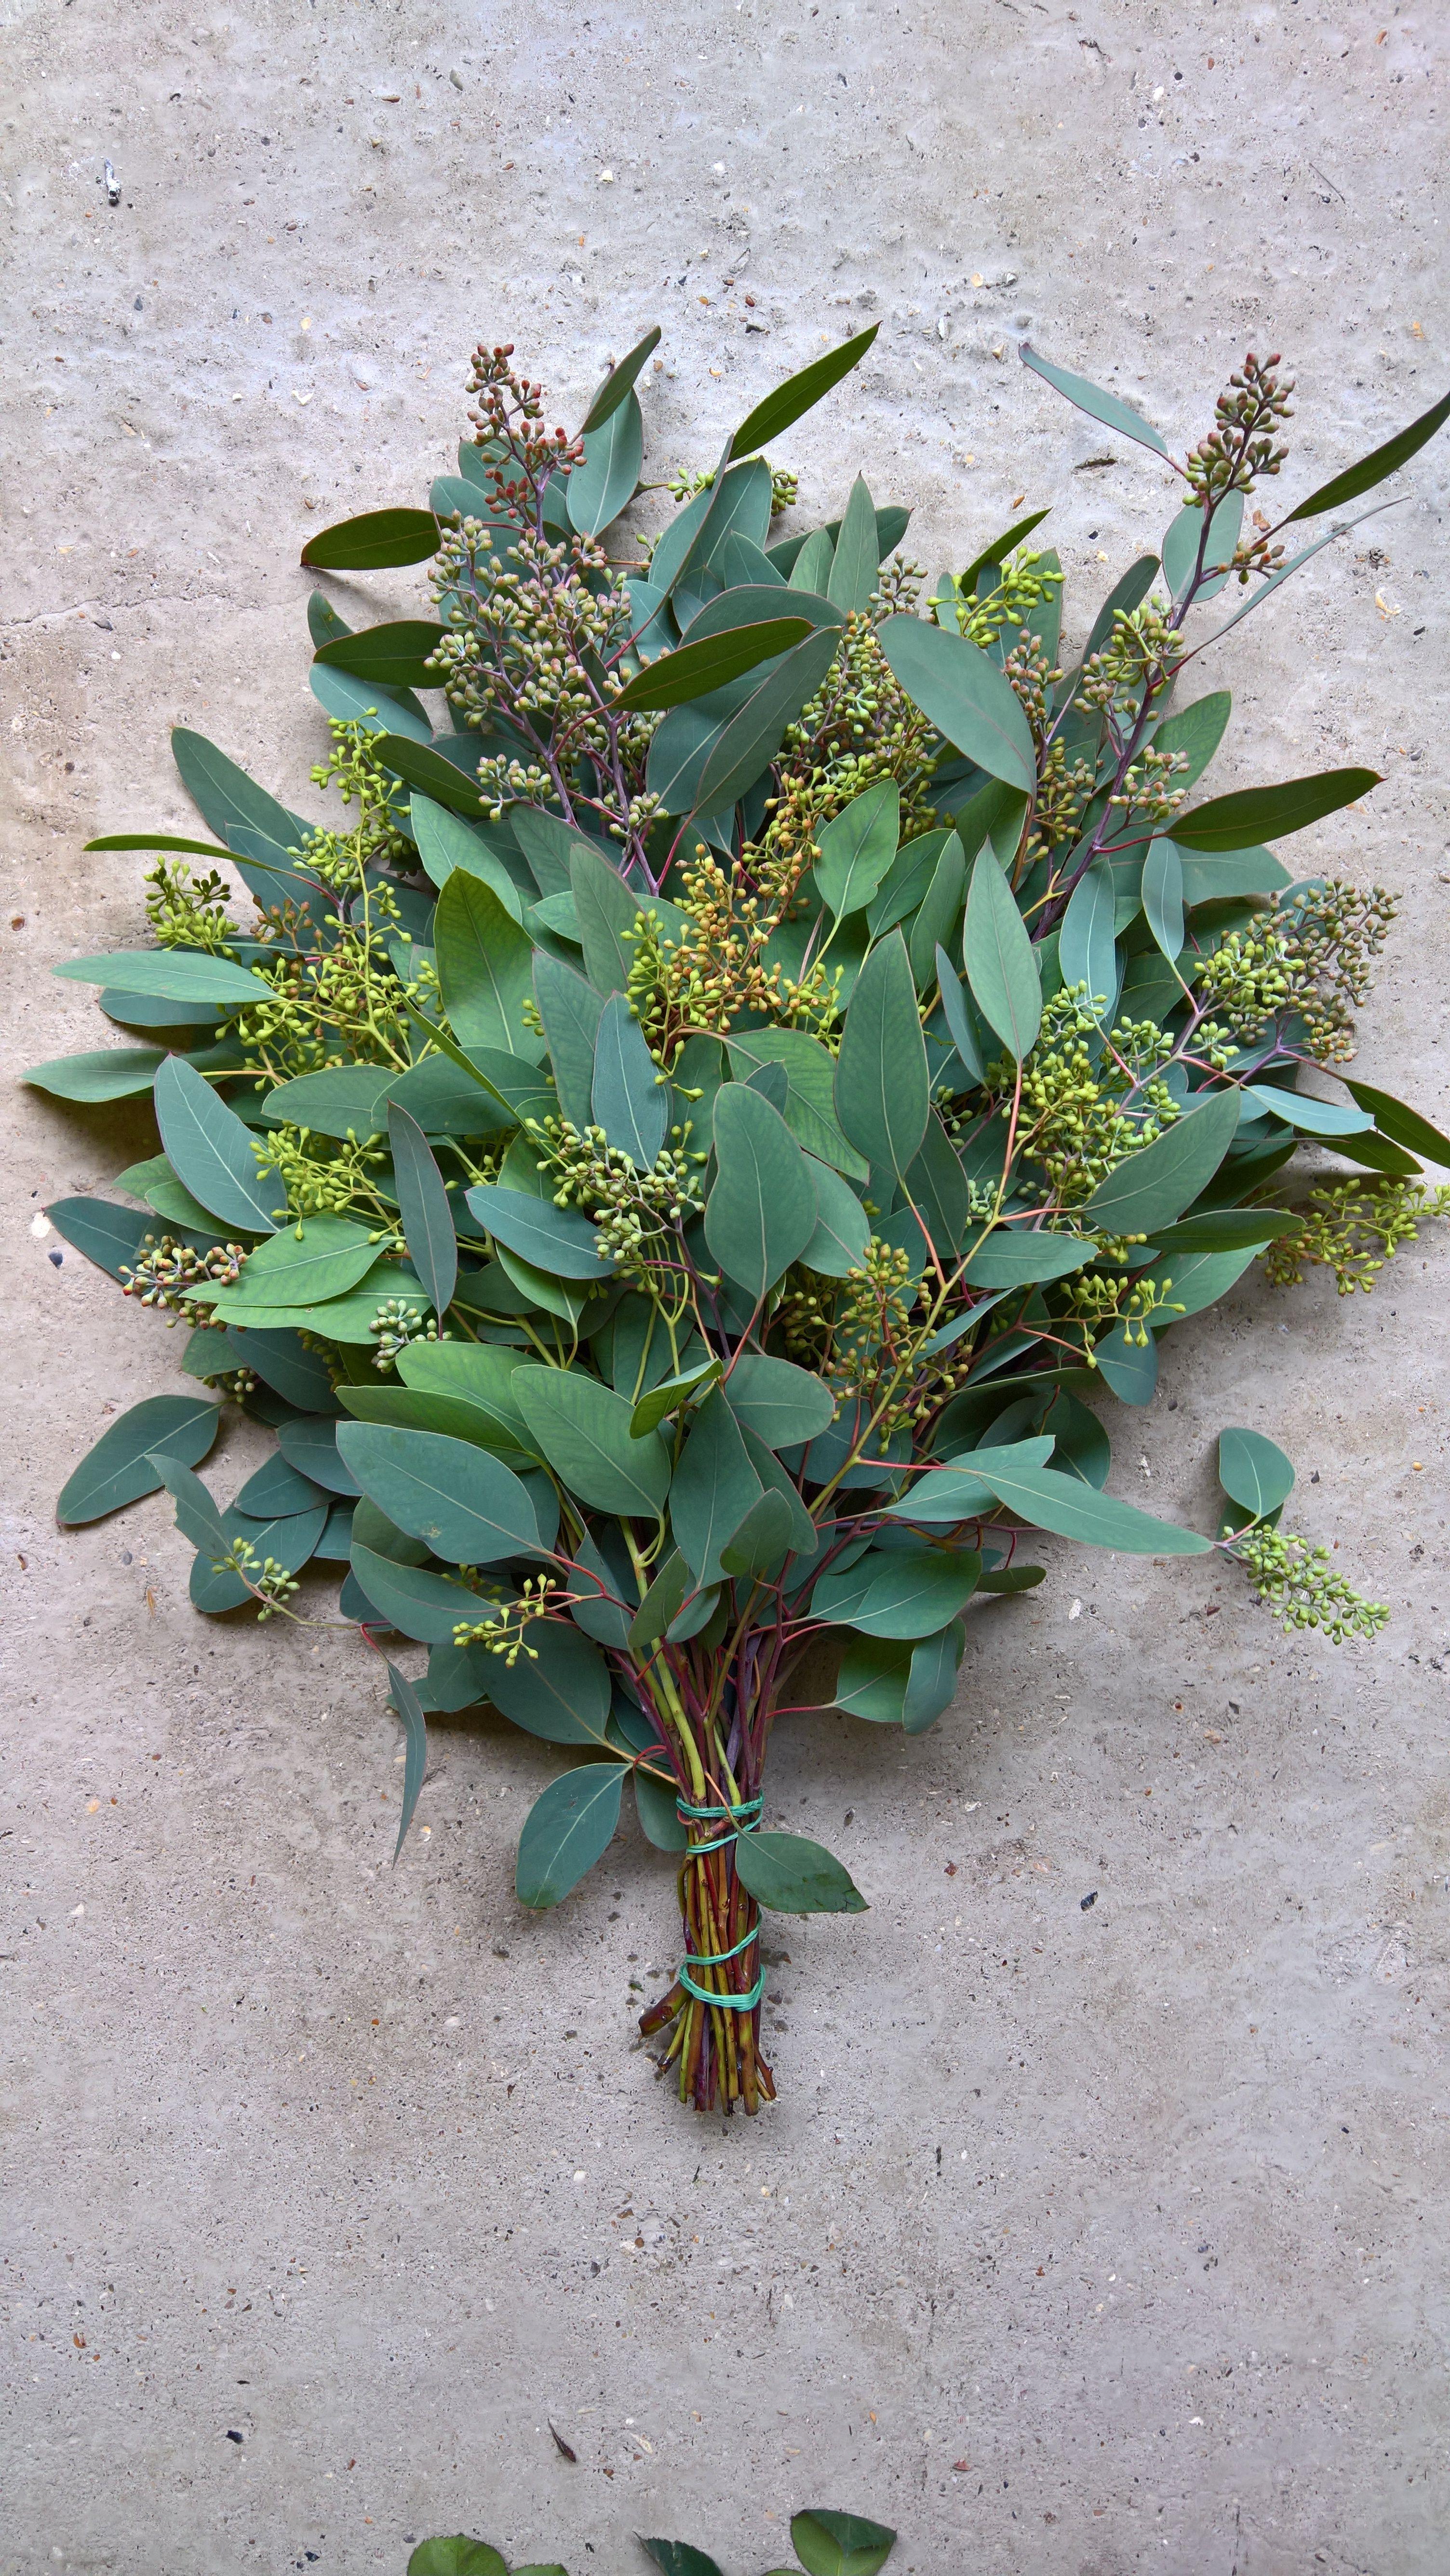 Eucalyptus Populus Strange Blooms Photoshoot 2 Blumen